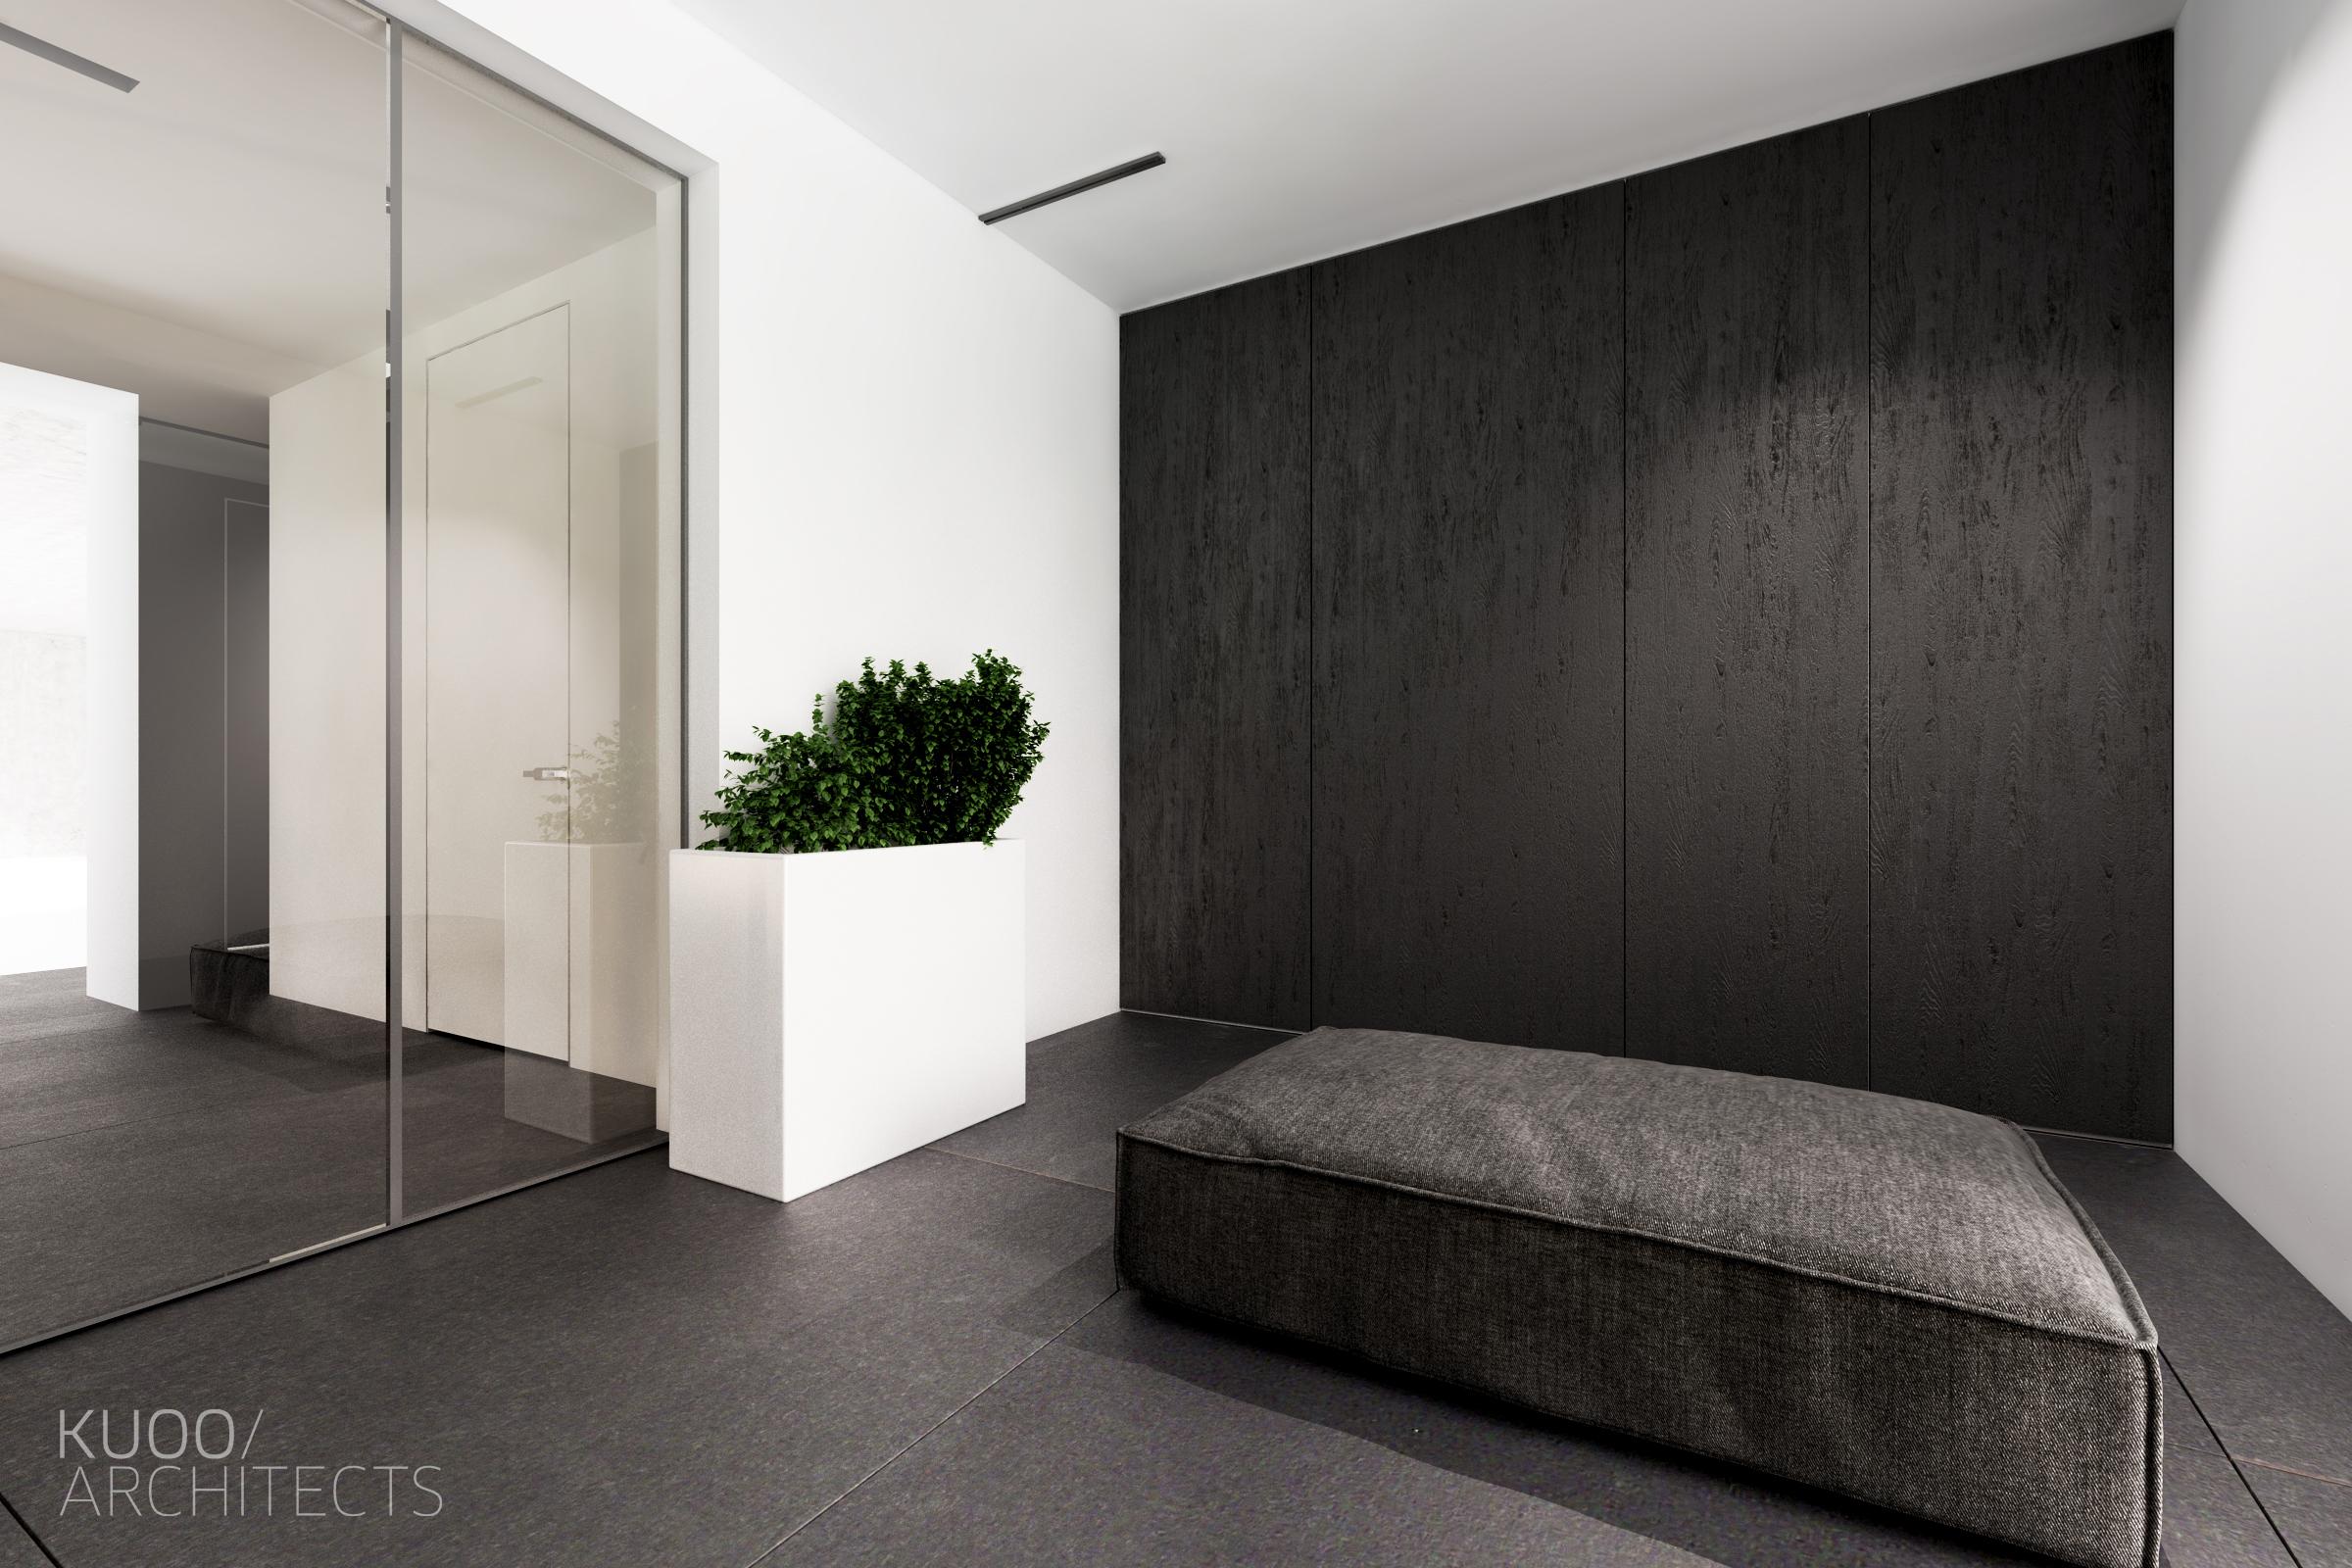 kuoo_architects_interior_design_minimal_contemporary (28) logo